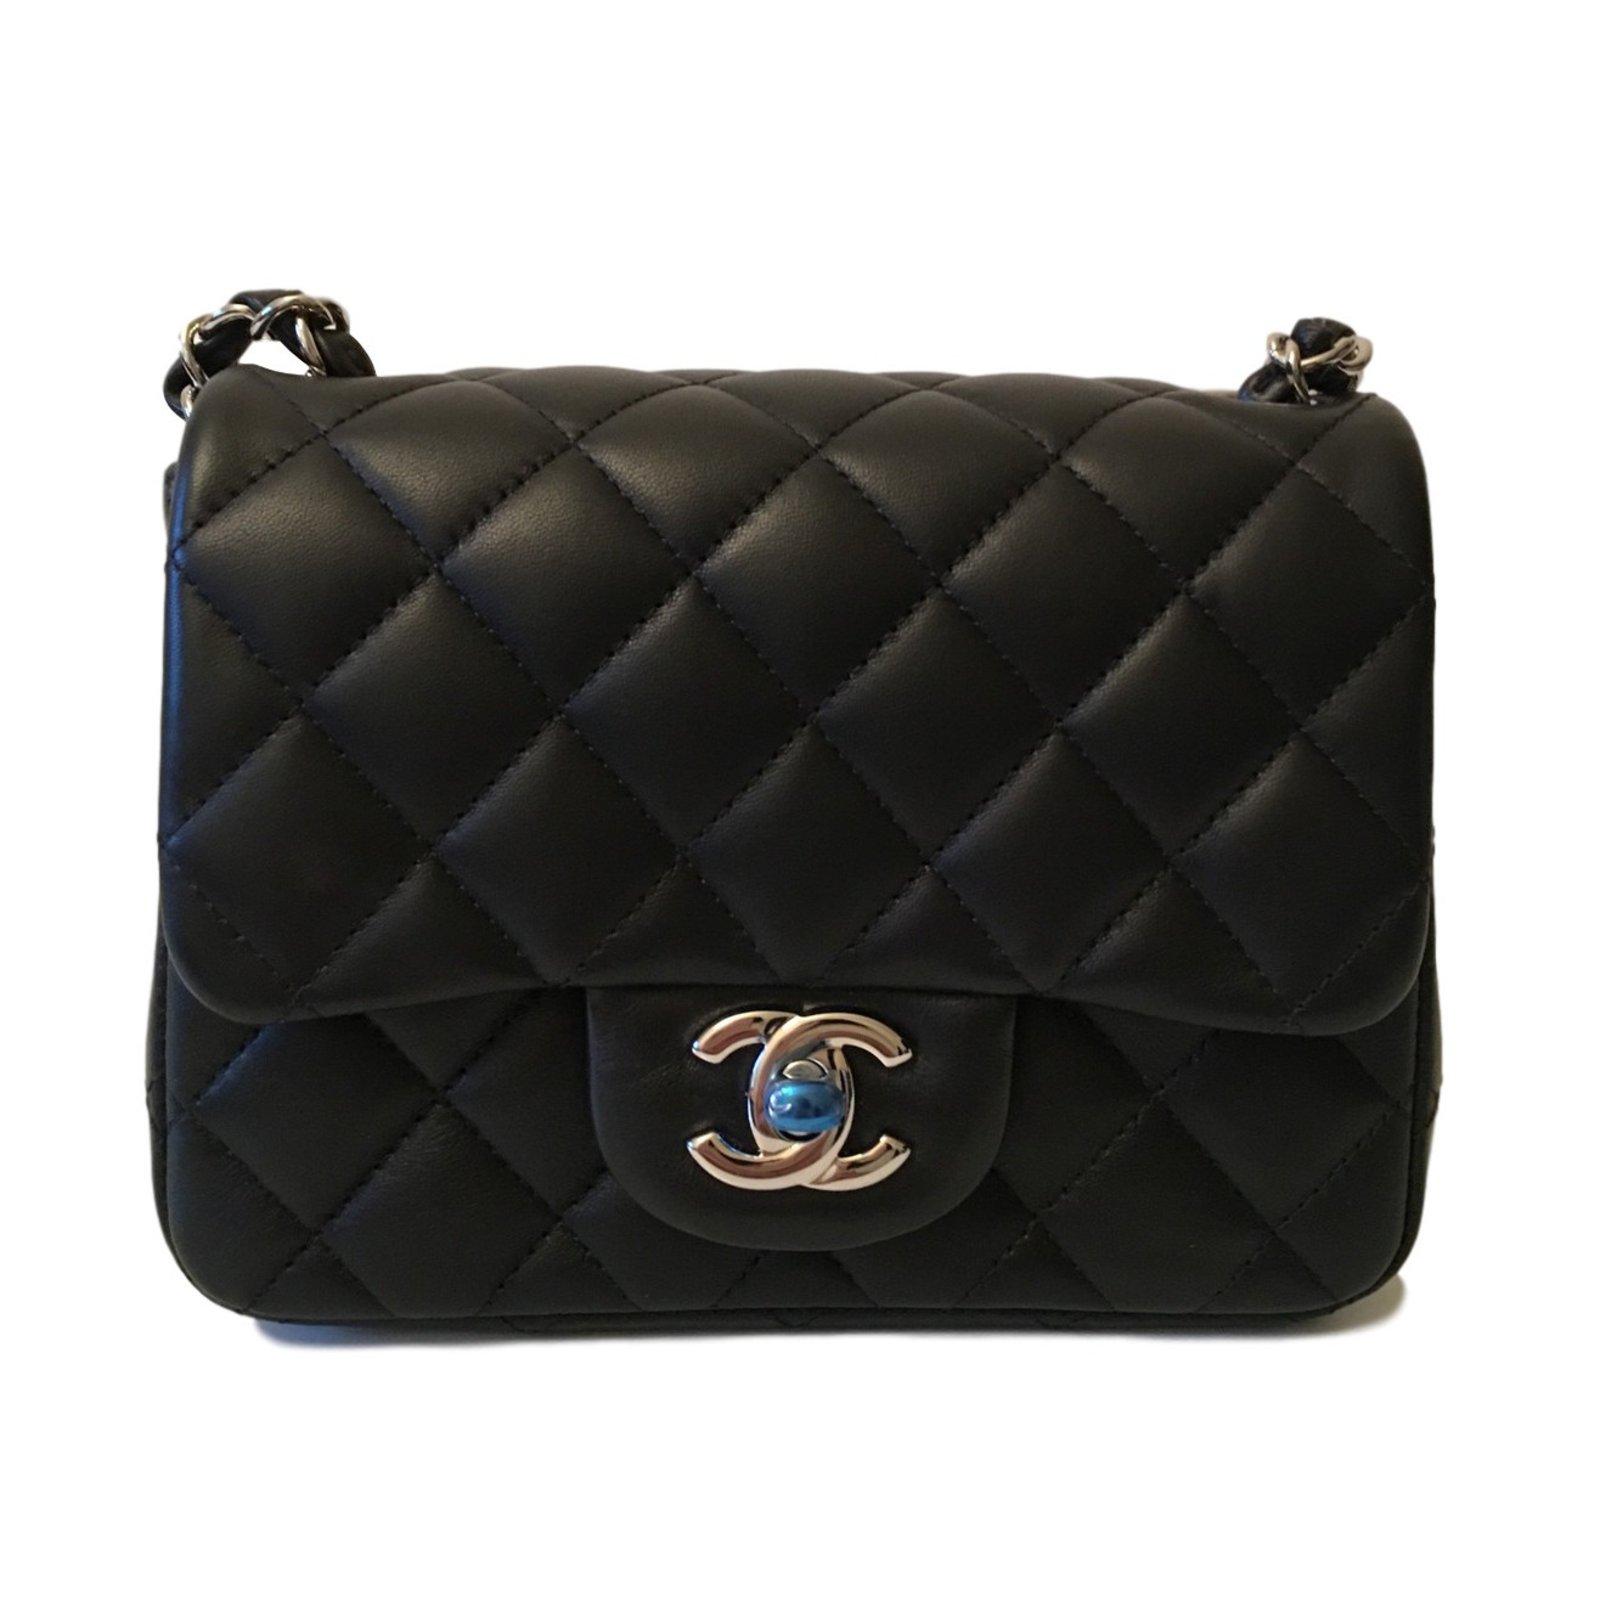 Chanel Timeless Mini Square Handbags Lambskin Black Ref 27591